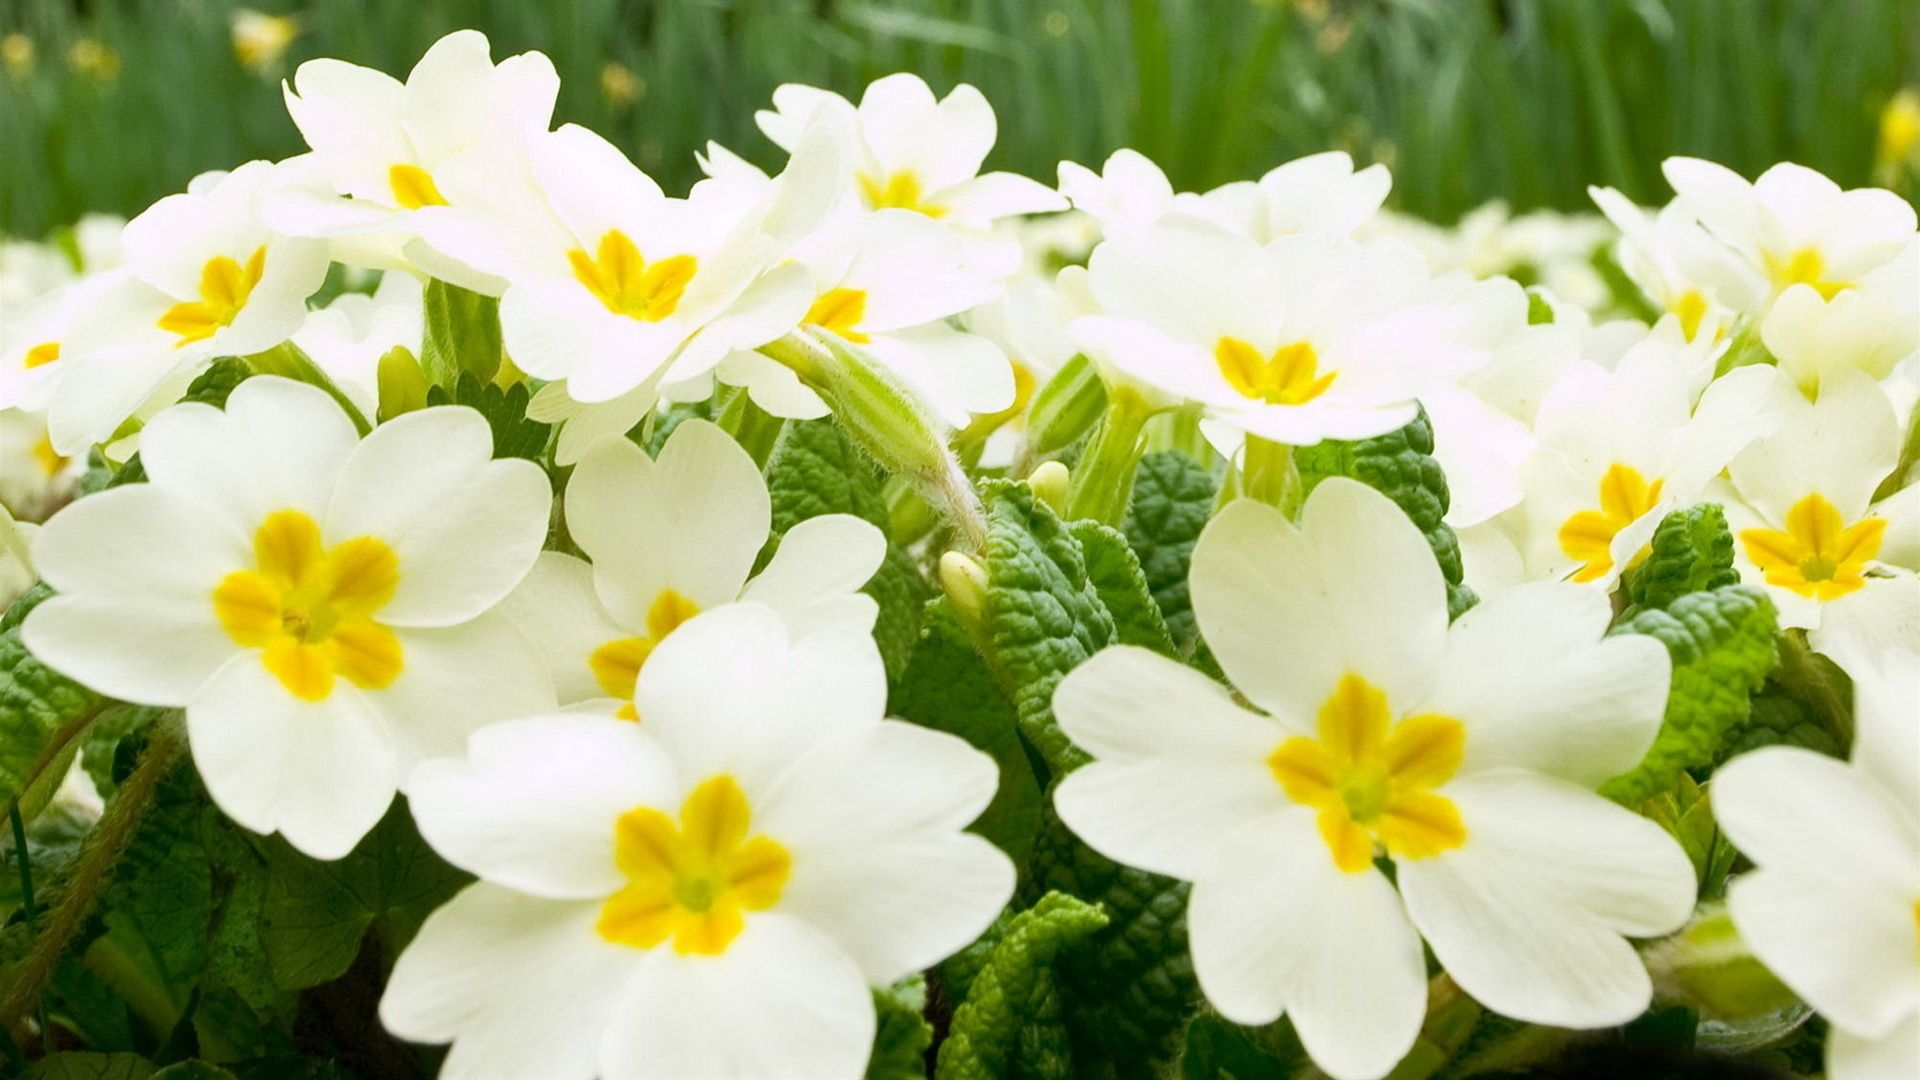 Garden Flowers Wallpaper beautiful white flower at garden, flowers wallpaper, hd phone